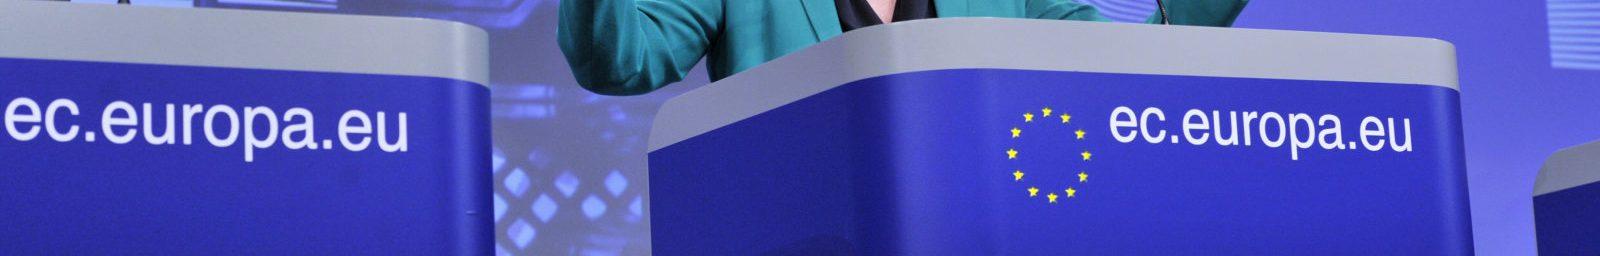 European Register of Data Protection Professionals (RDPP) | rdpp.info | www.eipacc.eu